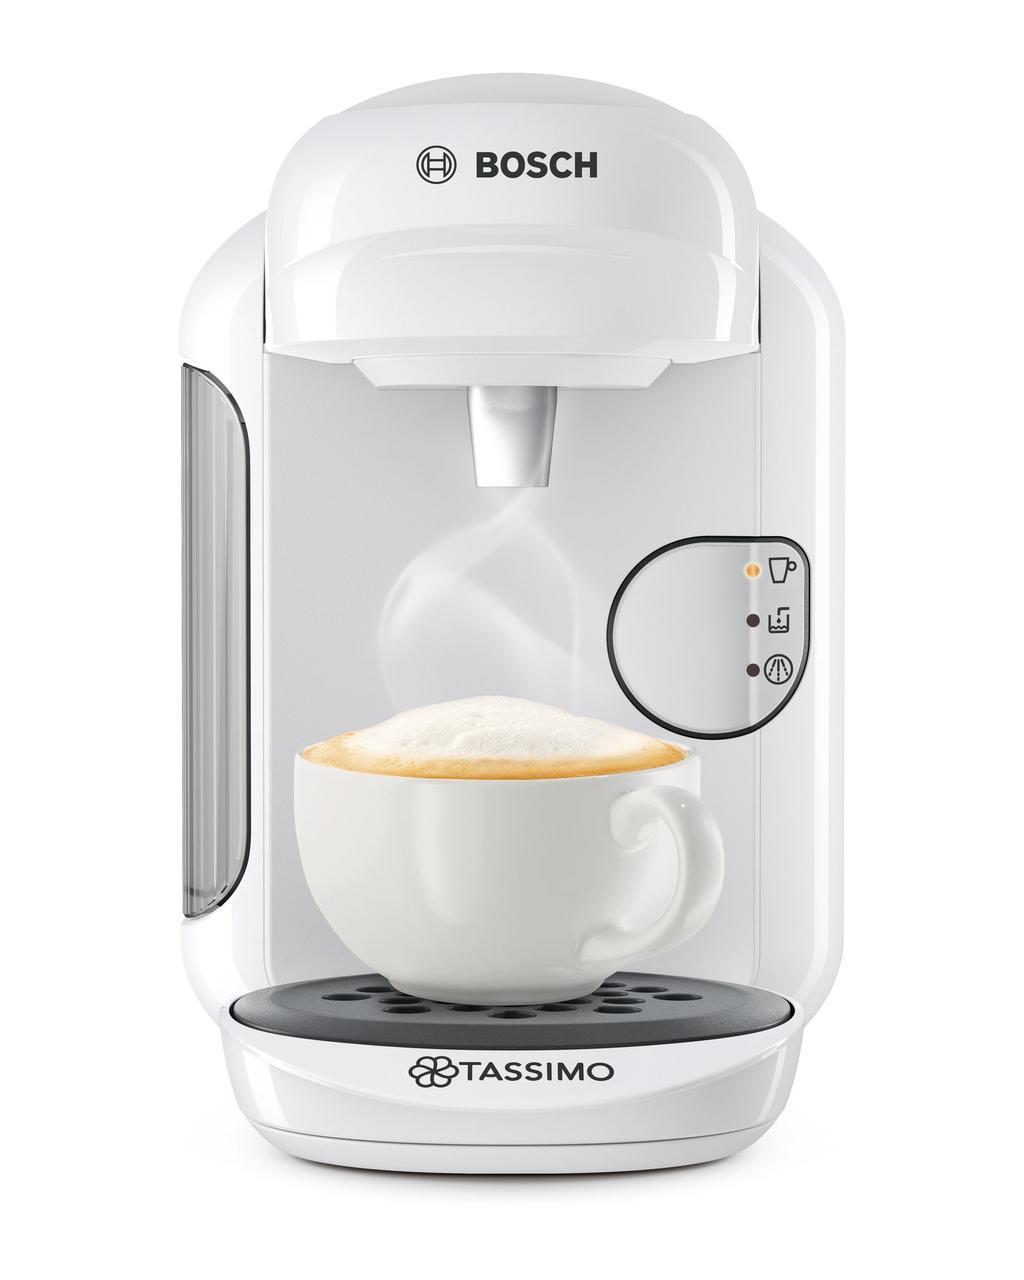 Кофеварка BOSCH TASSIMO VIVY 2 TAS 1404 Уценка